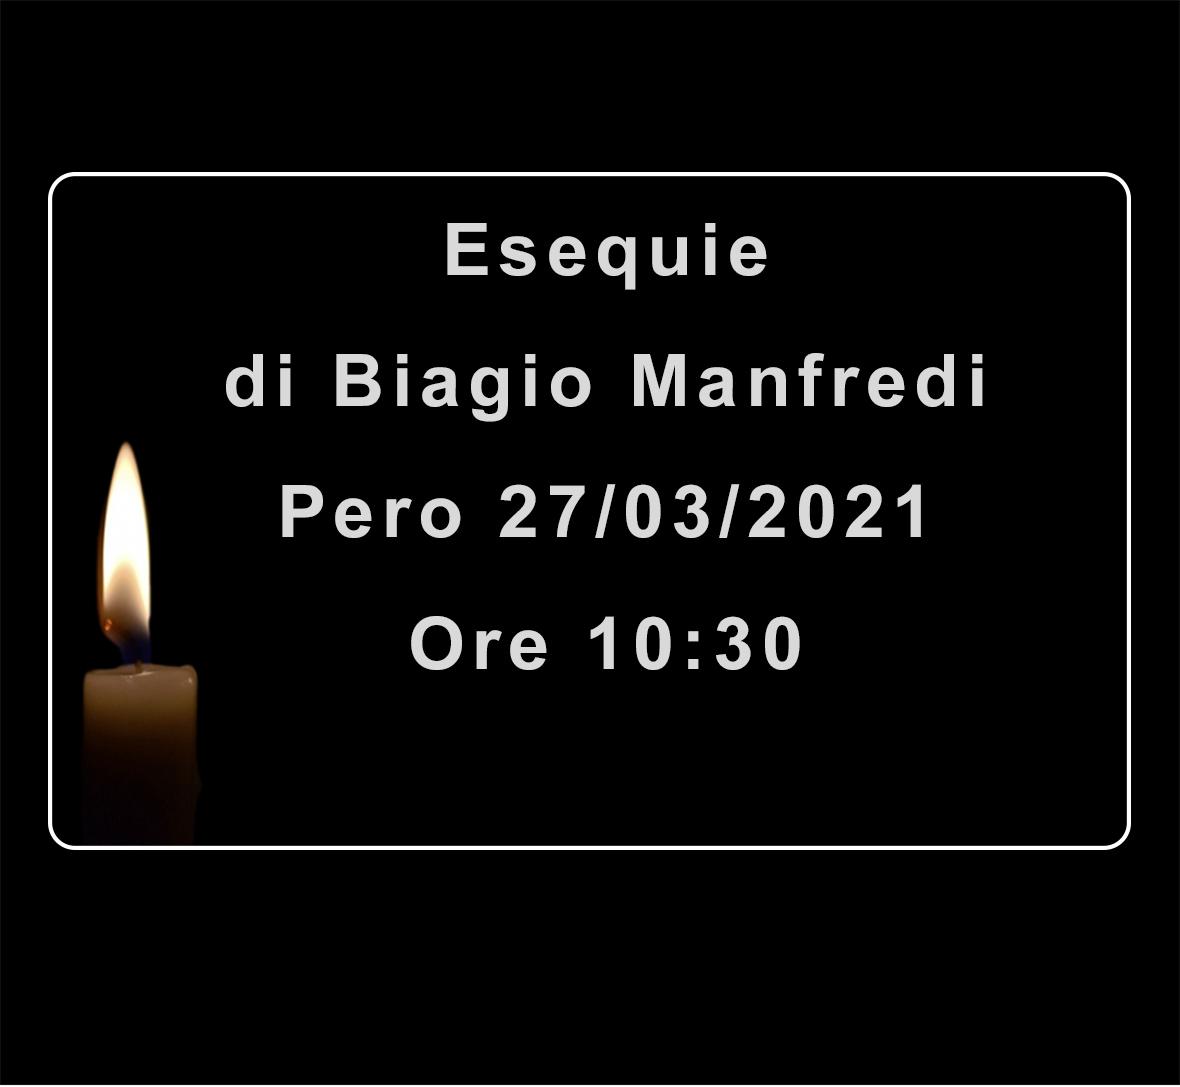 Esequie di  Biagio Manfredi